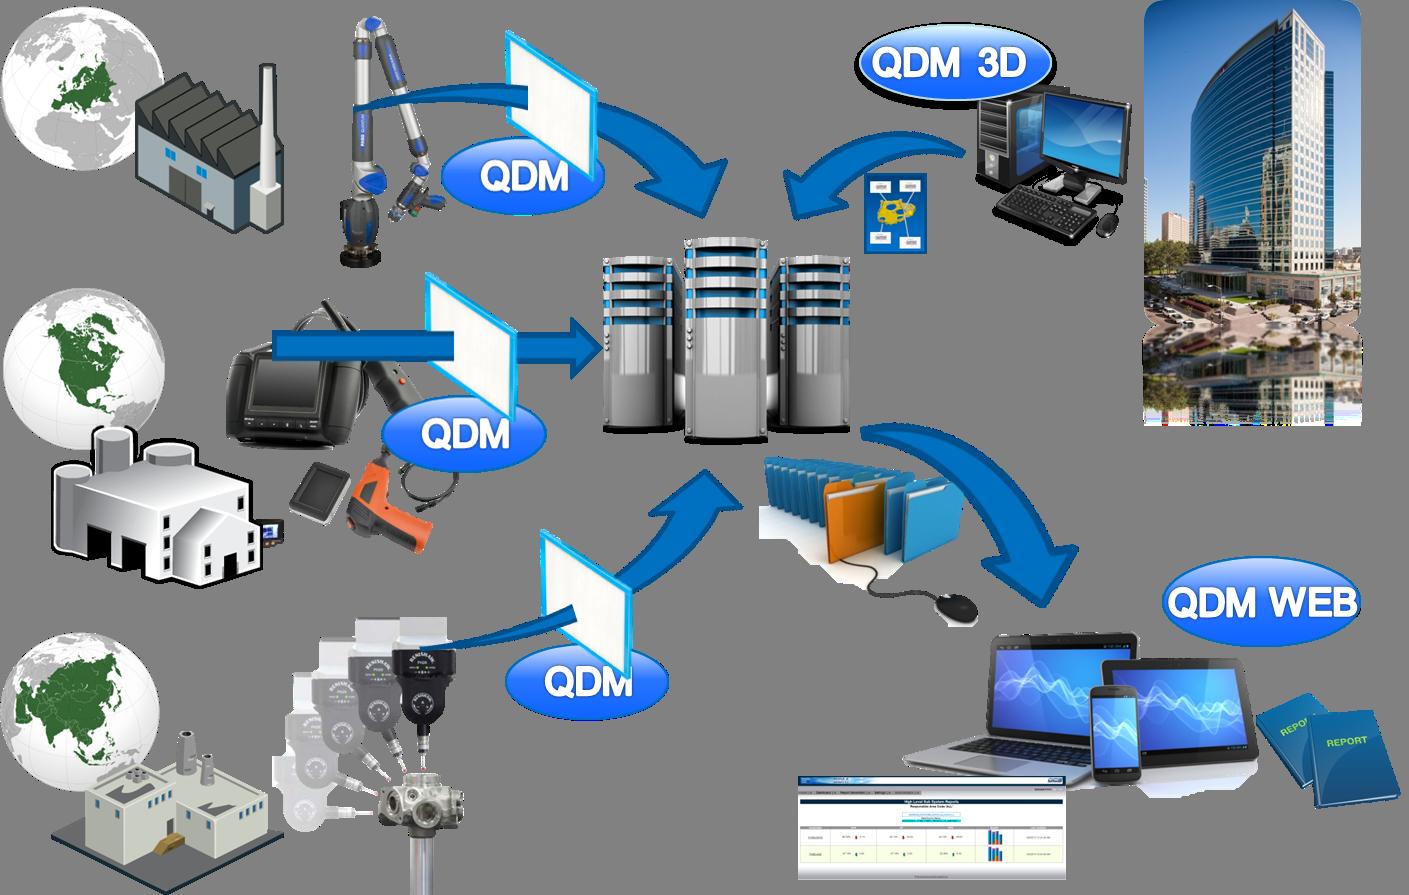 https://www.3dcs.com/hs-fs/hubfs/images/Website_Refresh_2016/QDM/QDM-system.png?width=2114&height=1343&name=QDM-system.png